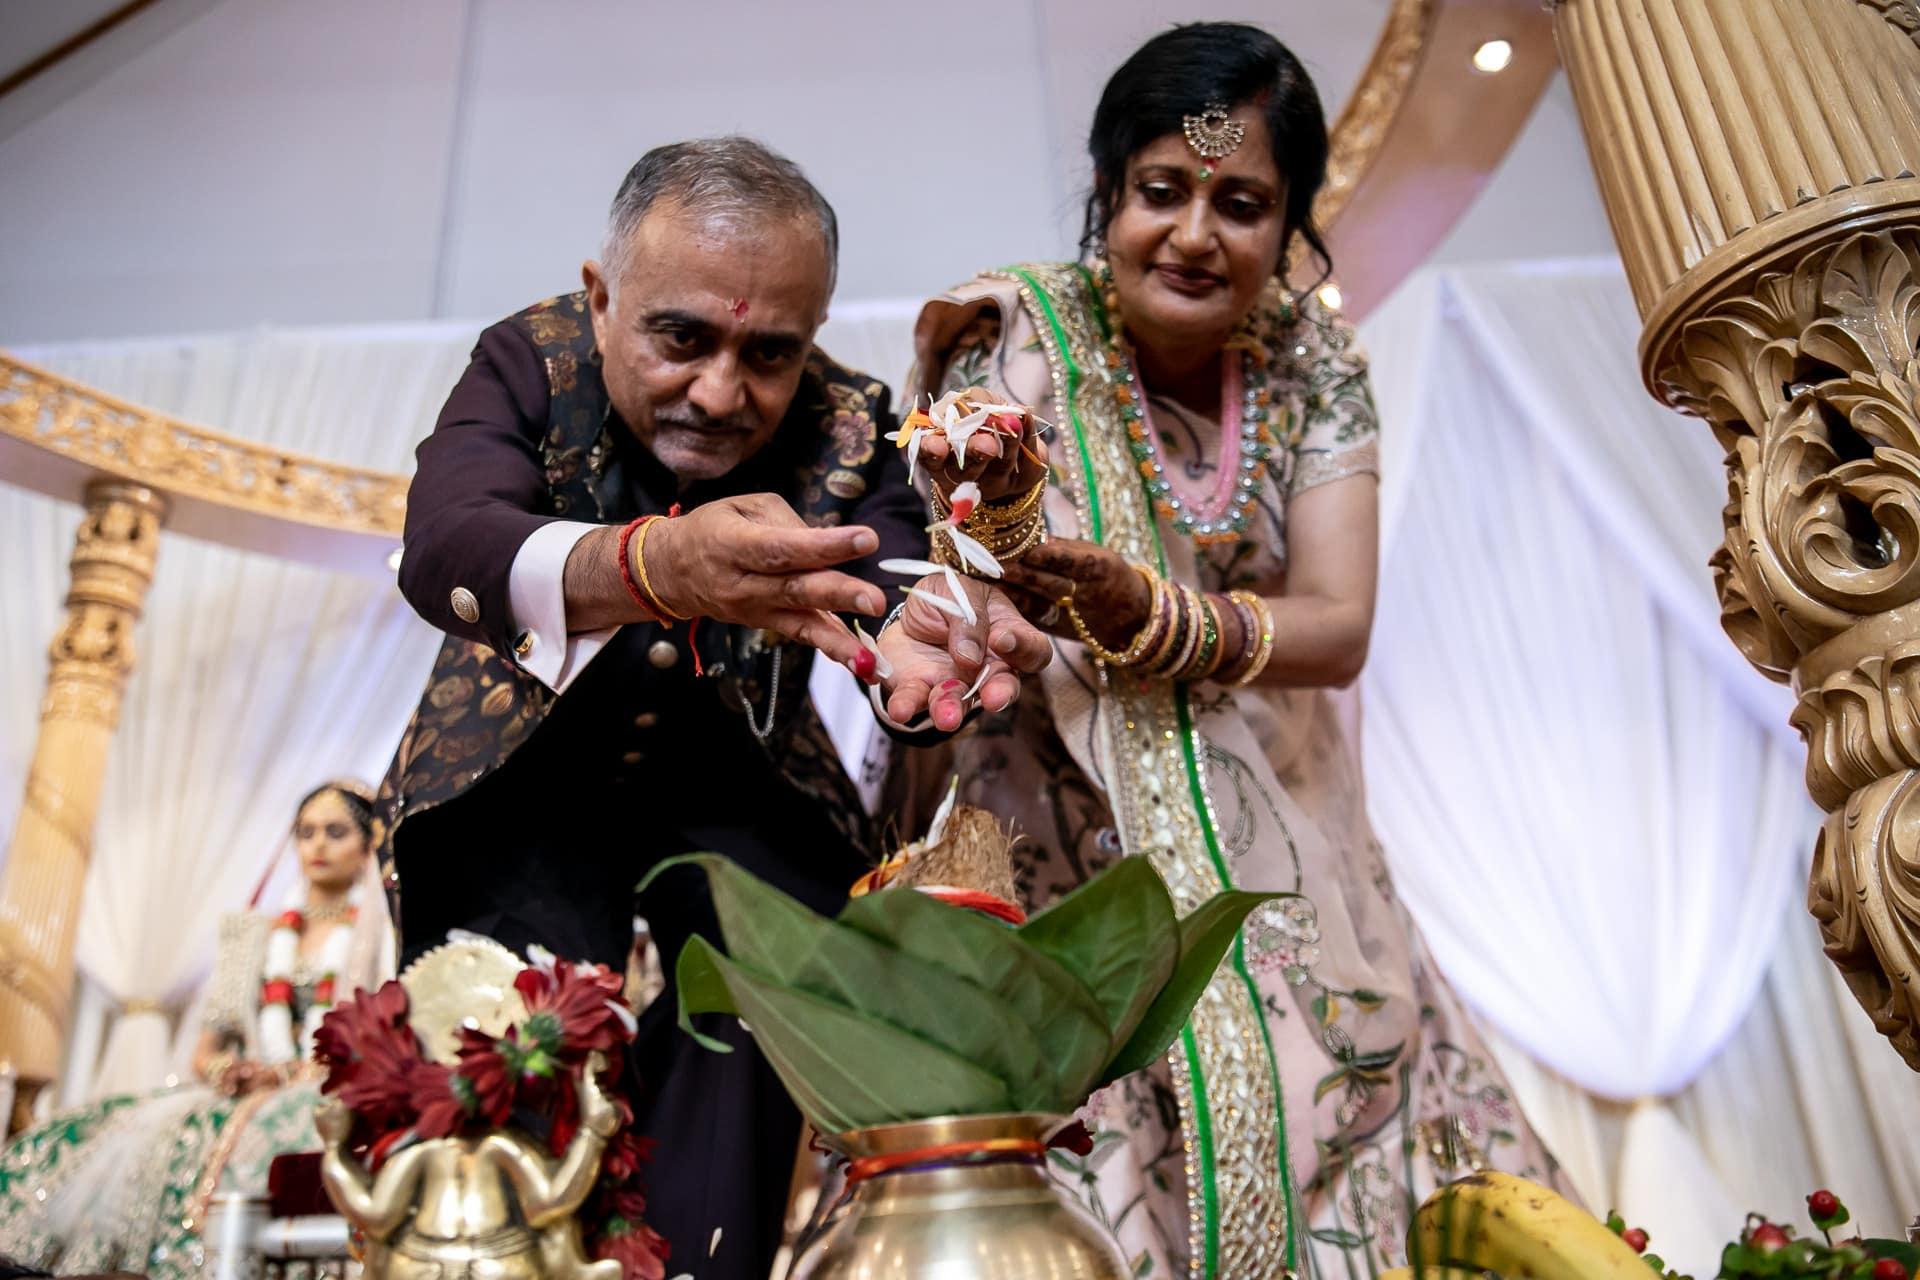 Ganesh Pooja during Hindu wedding ceremony at The Haveli